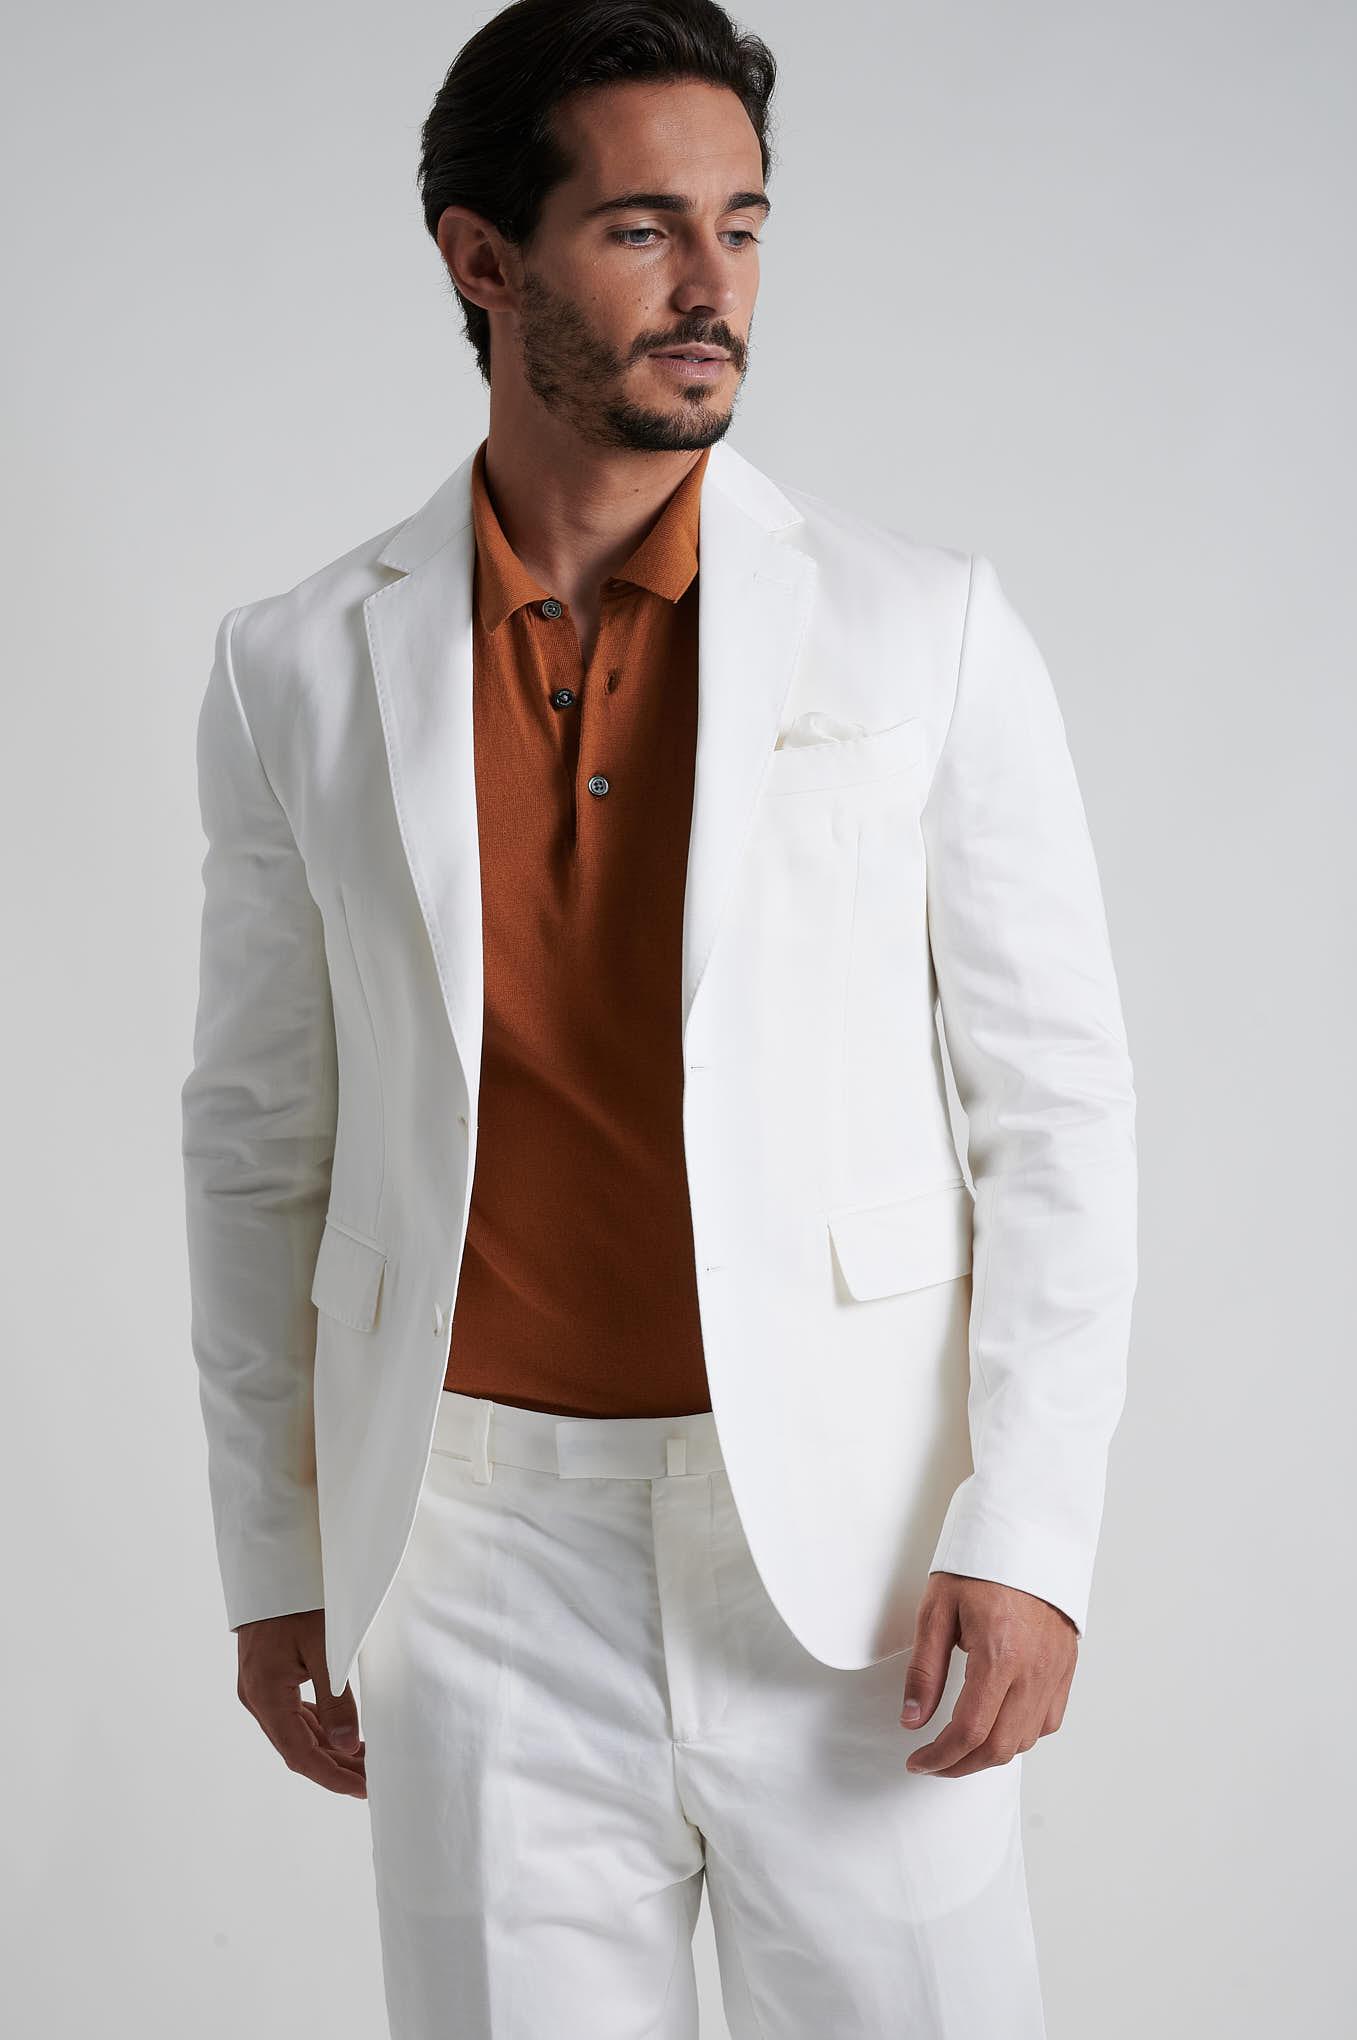 Blazer White Formal Man